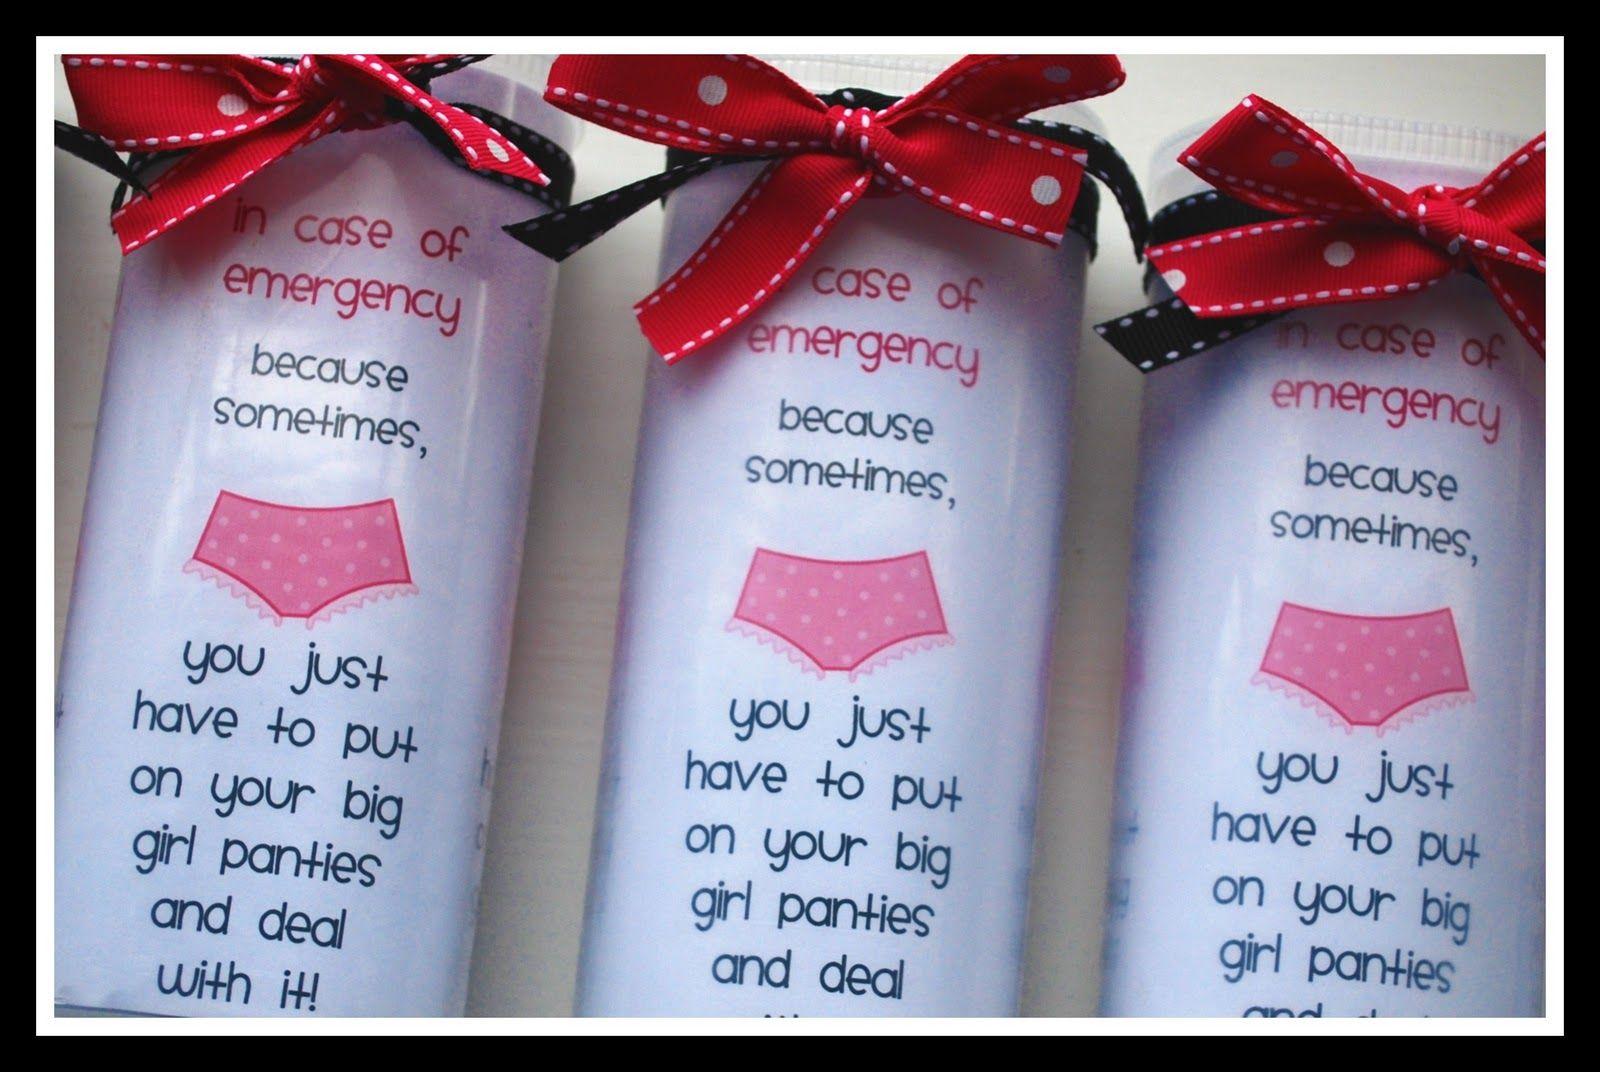 Big girl pantie gift ideas 50th birthday gag gifts